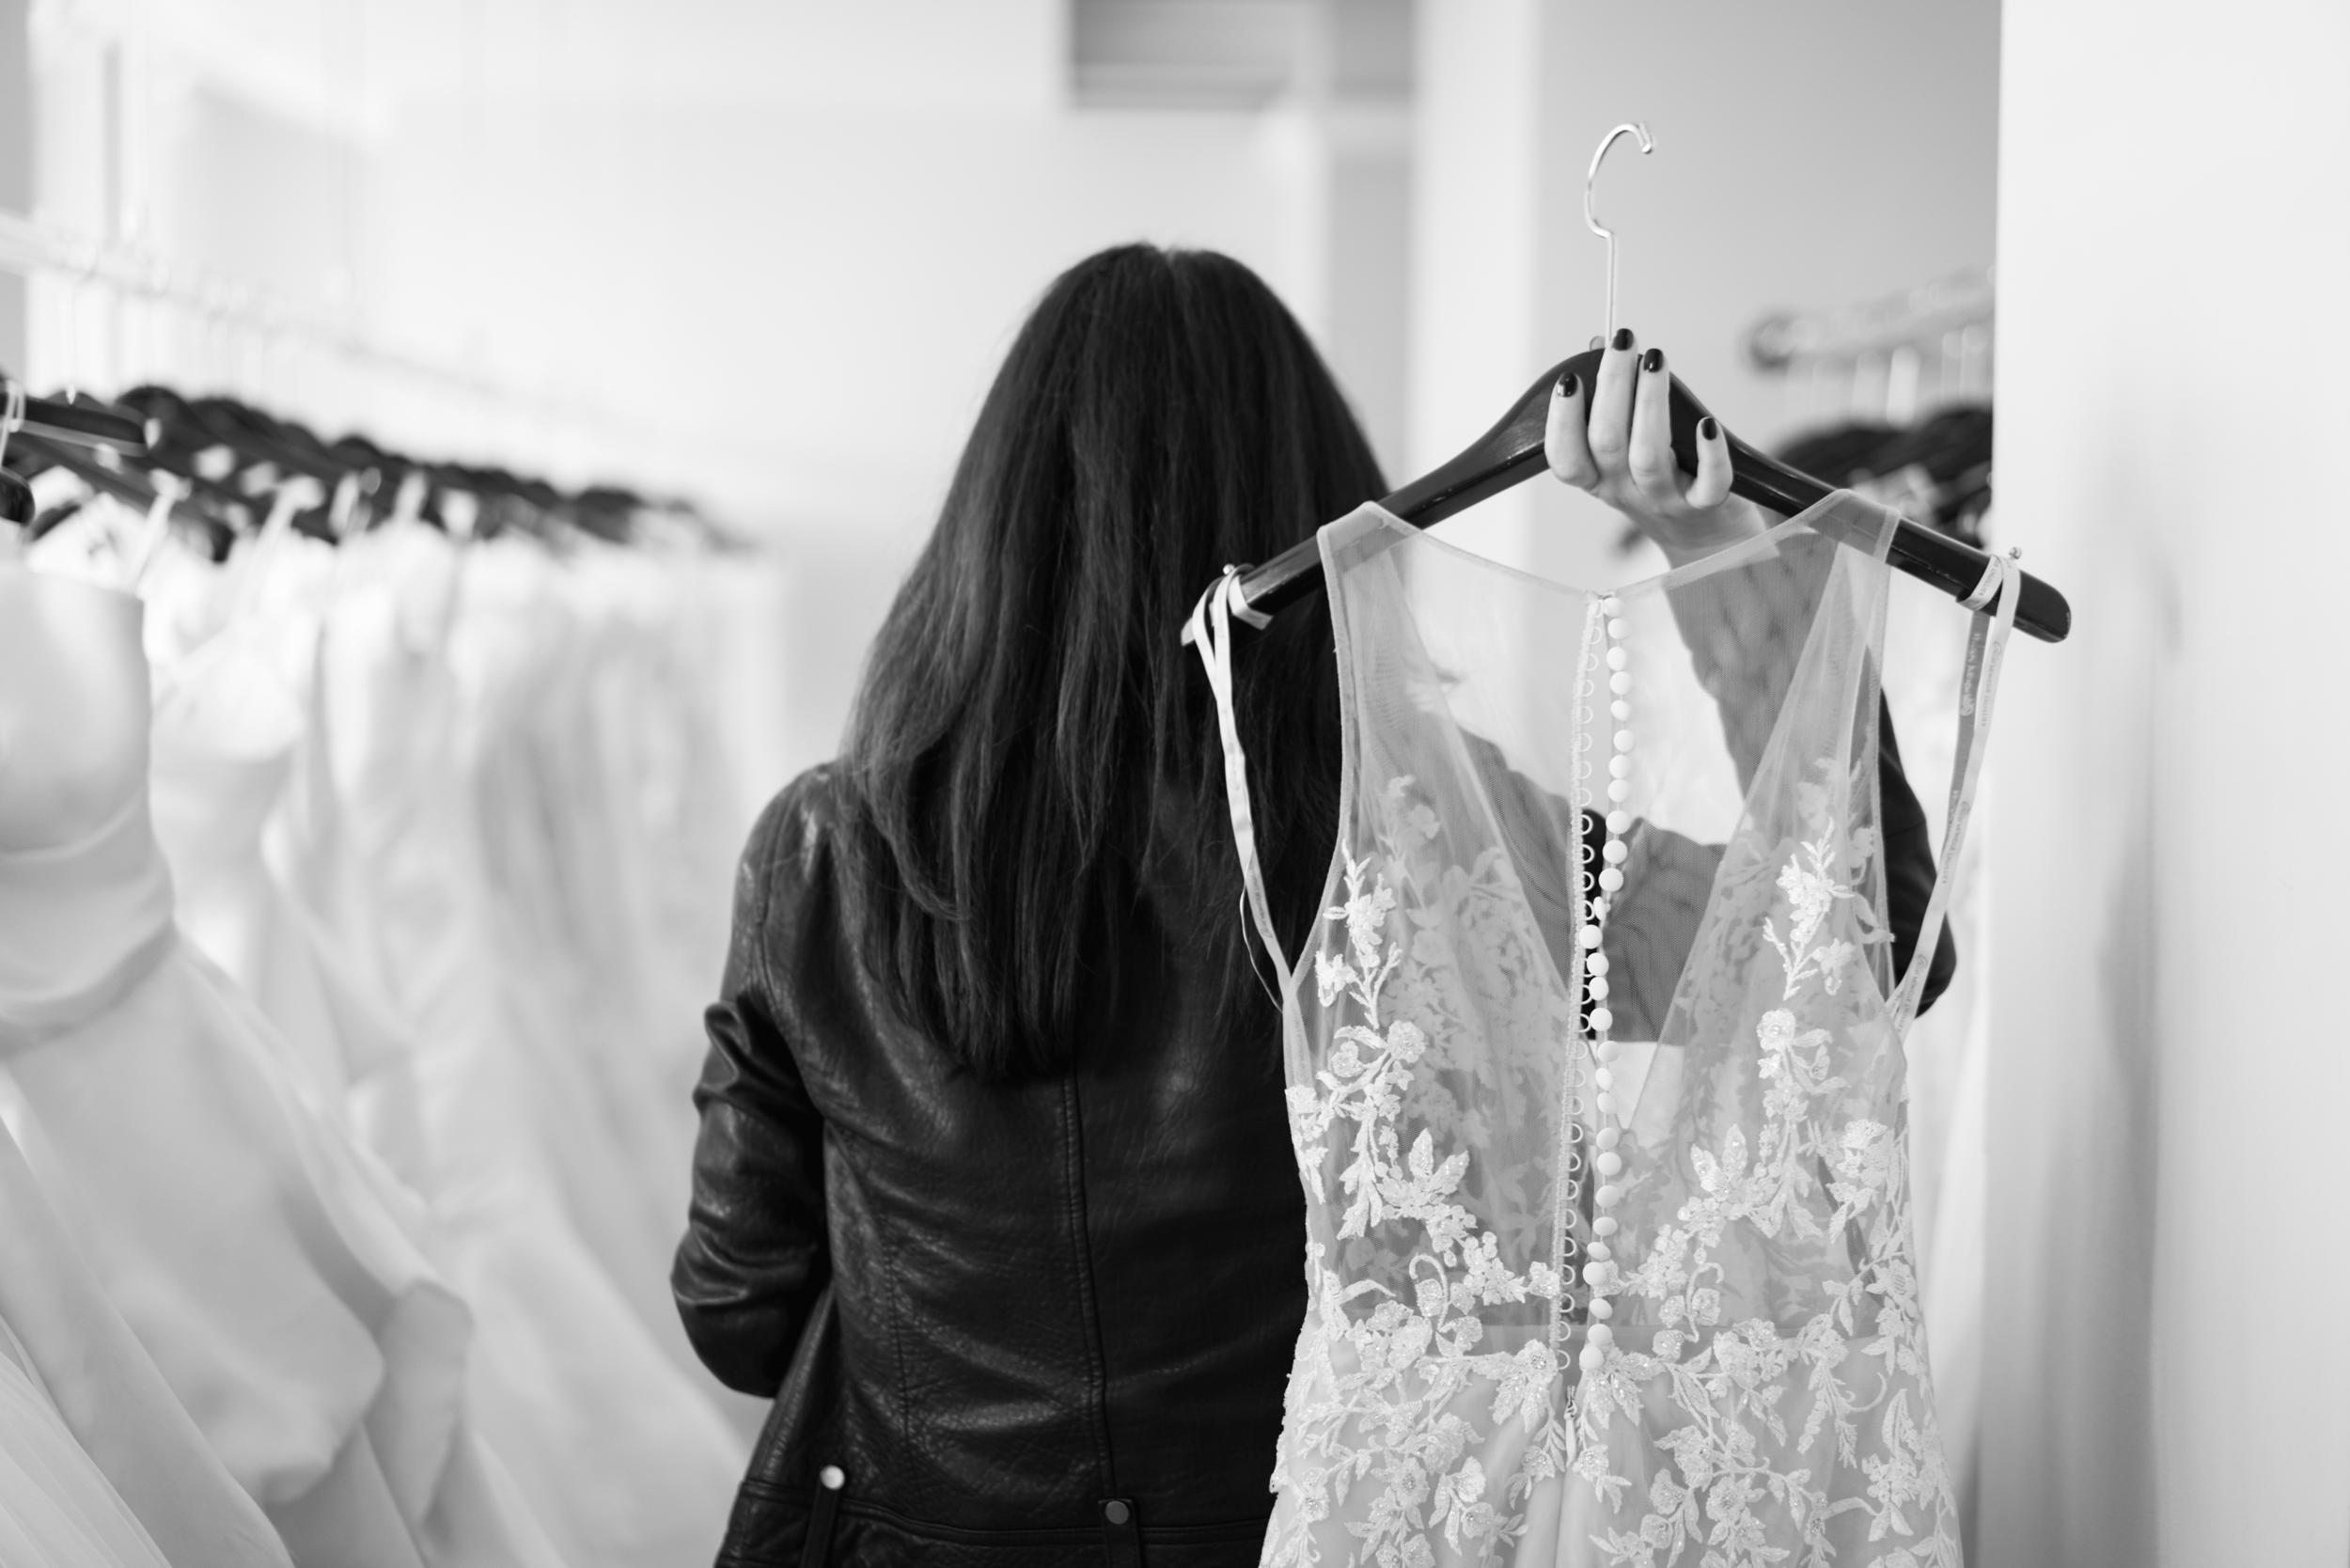 picking-out-dresses-warren-barron-bridal.png